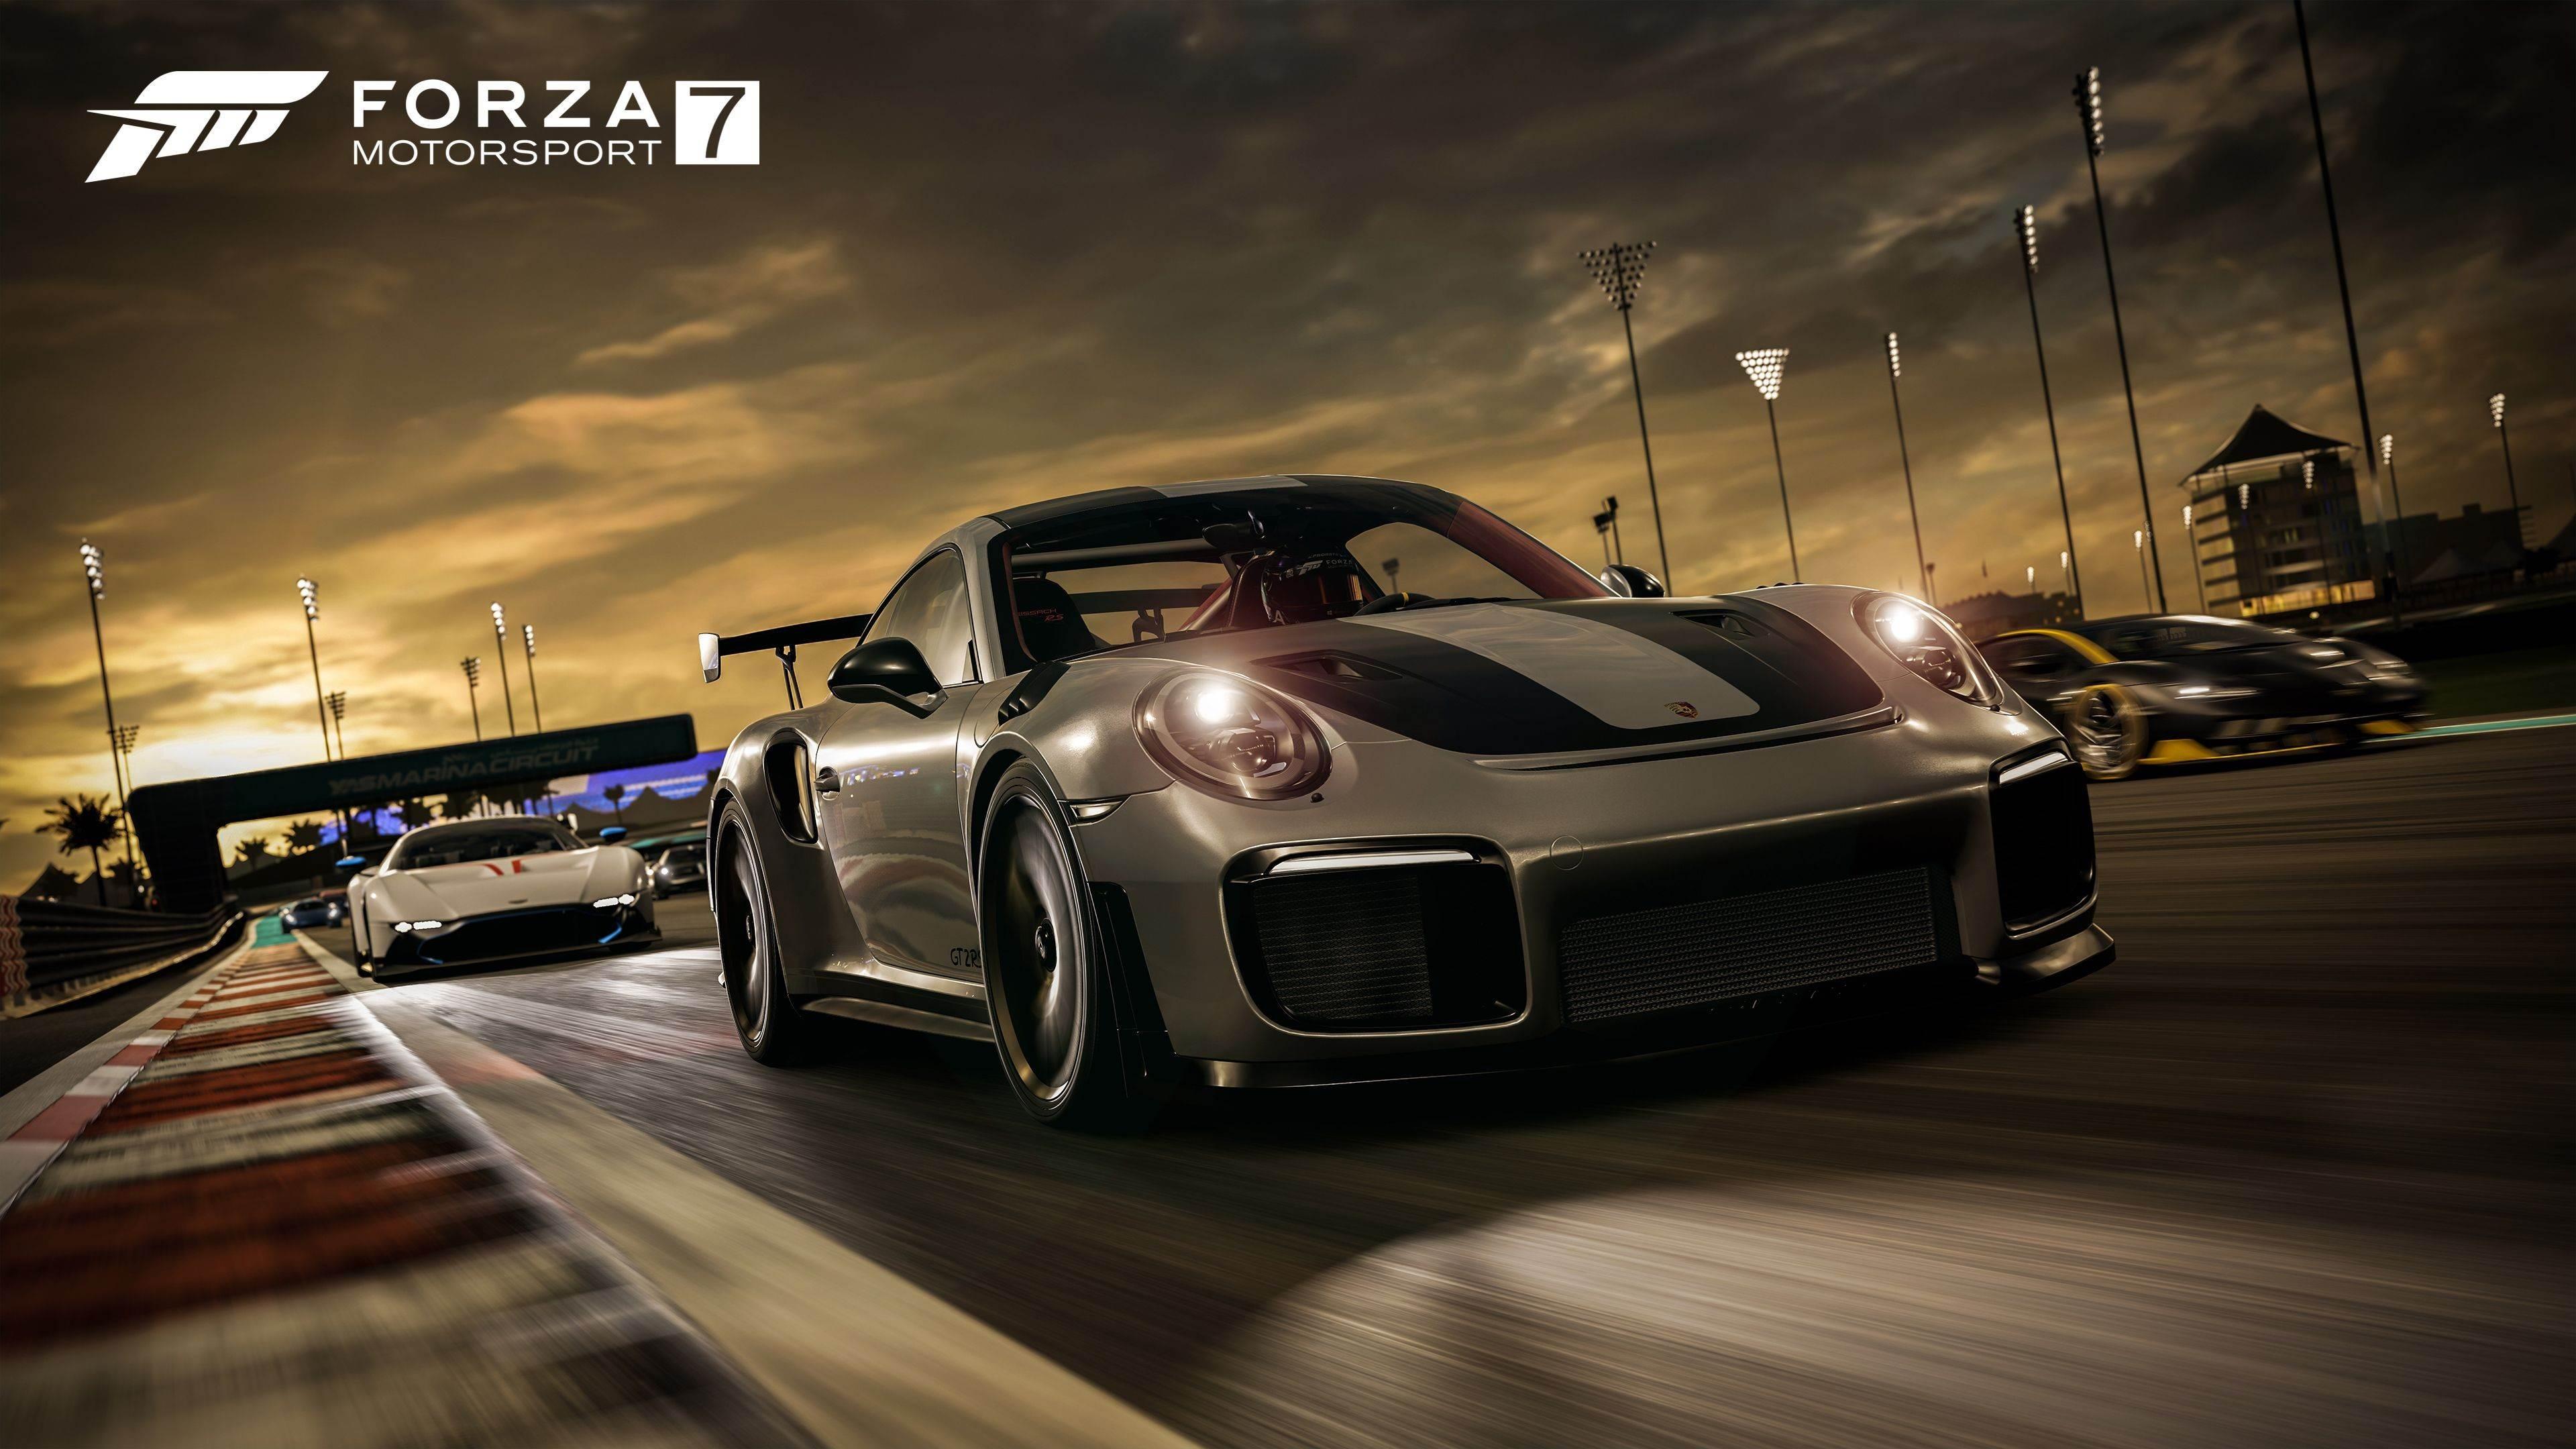 Forza Motorsport 7 Porsche 911 Gt2 Rs 4k Wallpaper